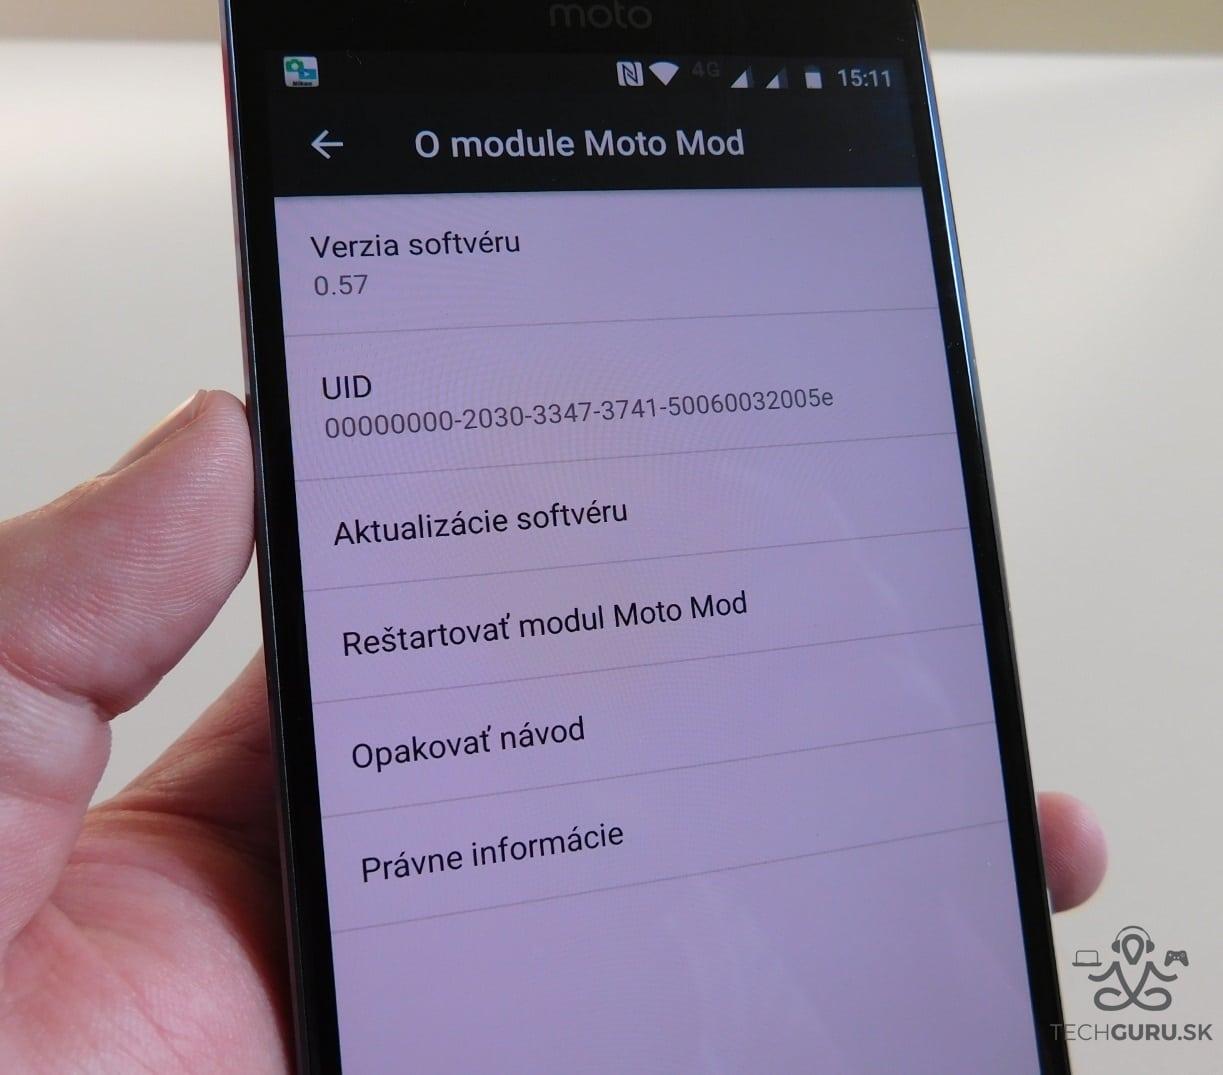 Motorola Moto Z2 Play a motomods - Soundboost 2 02